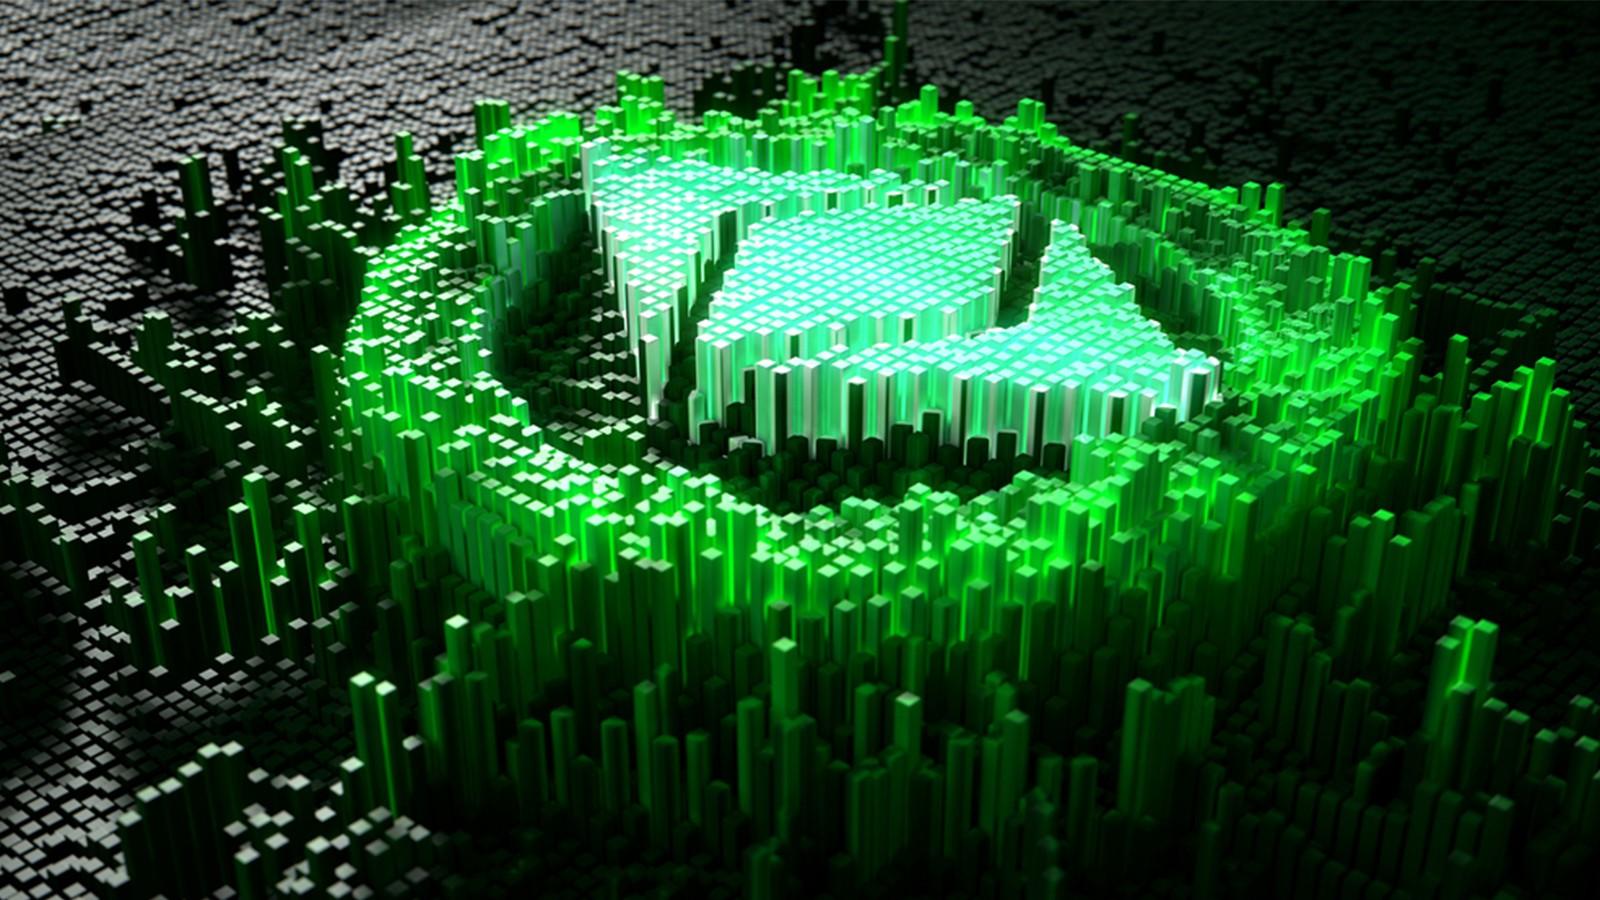 Криптовалюта Ethereum Classic подверглась атаке 51%